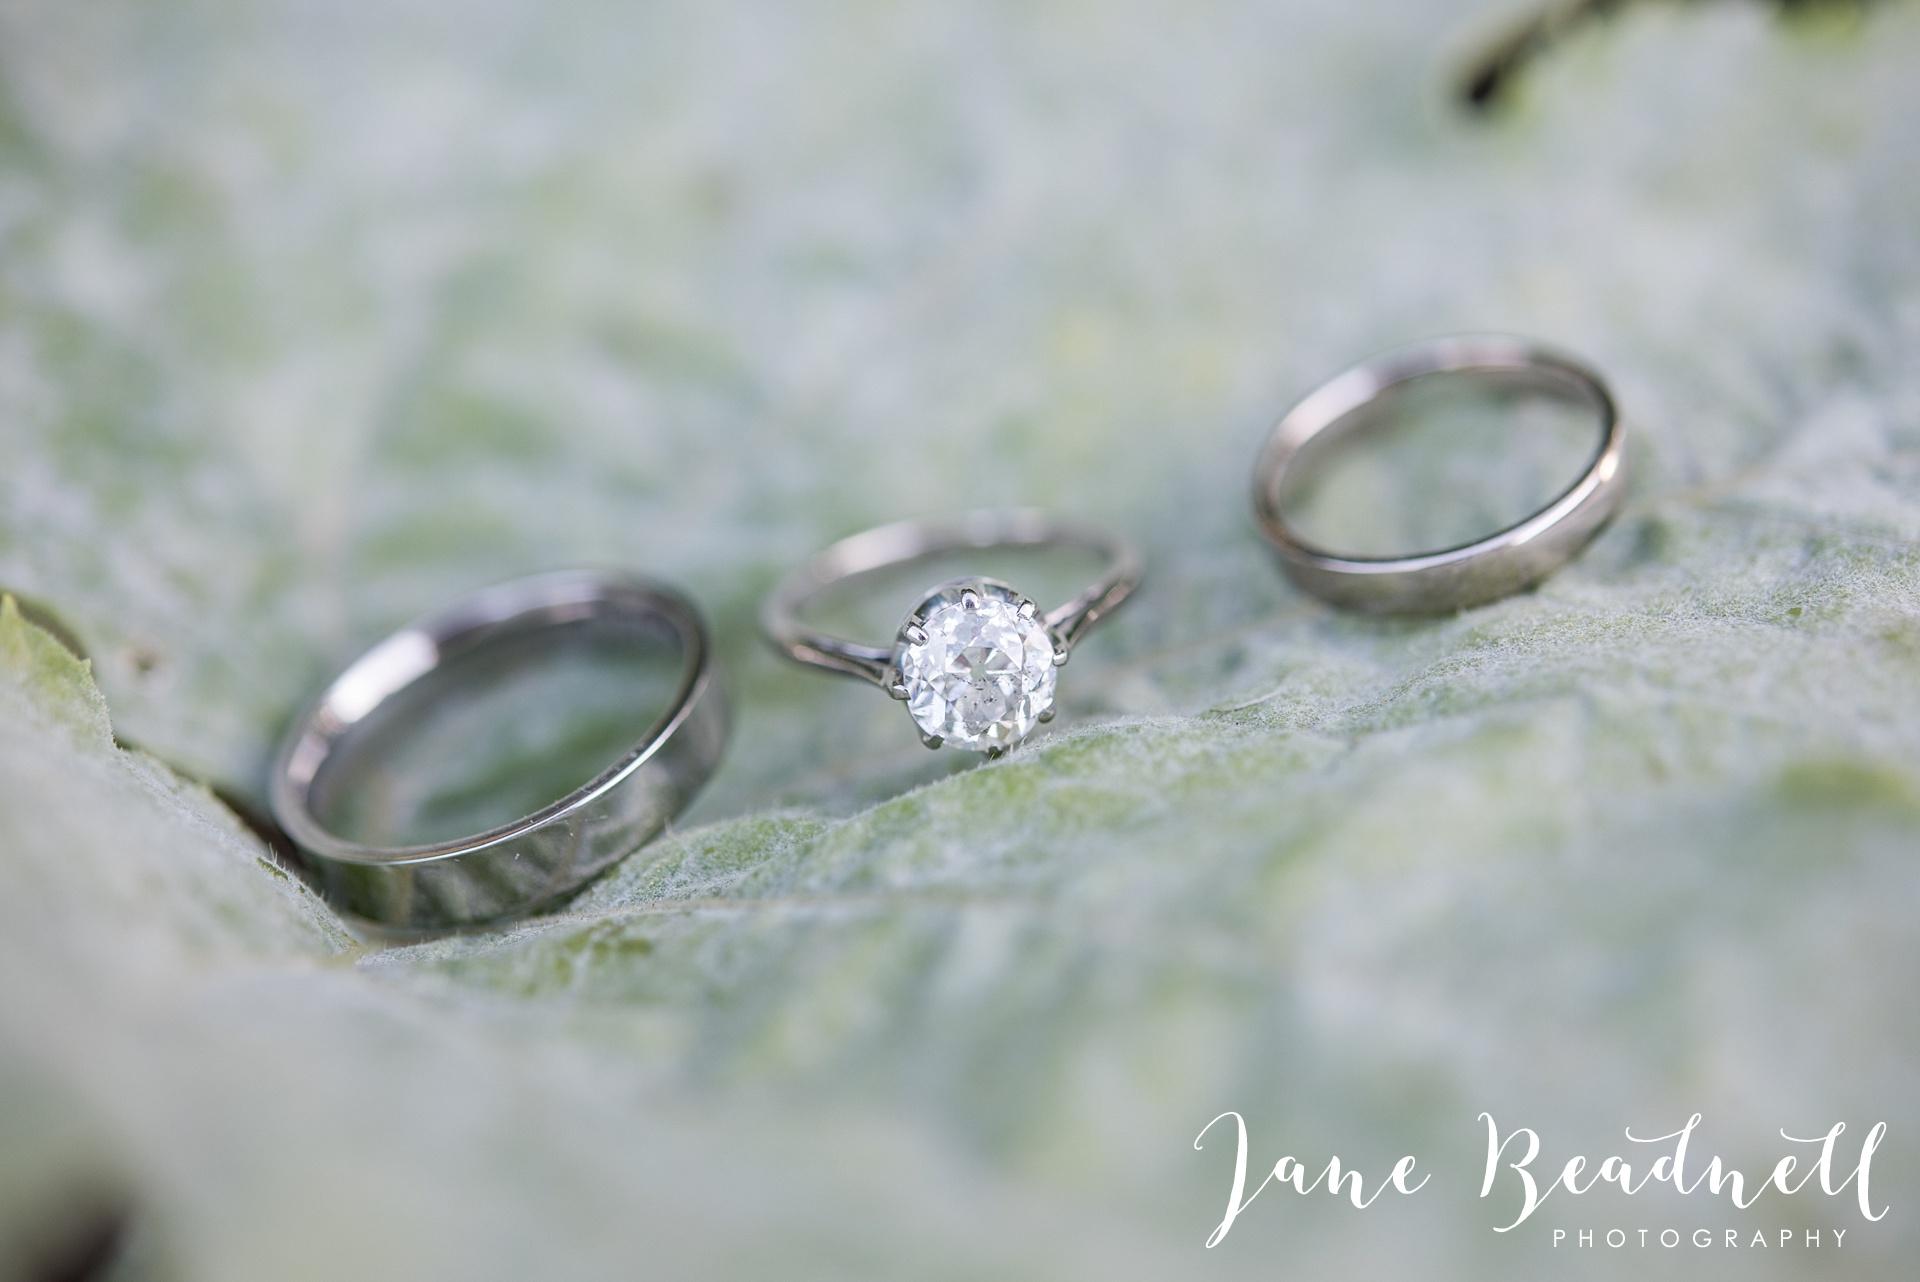 fine-art-wedding-photographer-jane-beadnell-yorkshire-wedding-photographer_0104